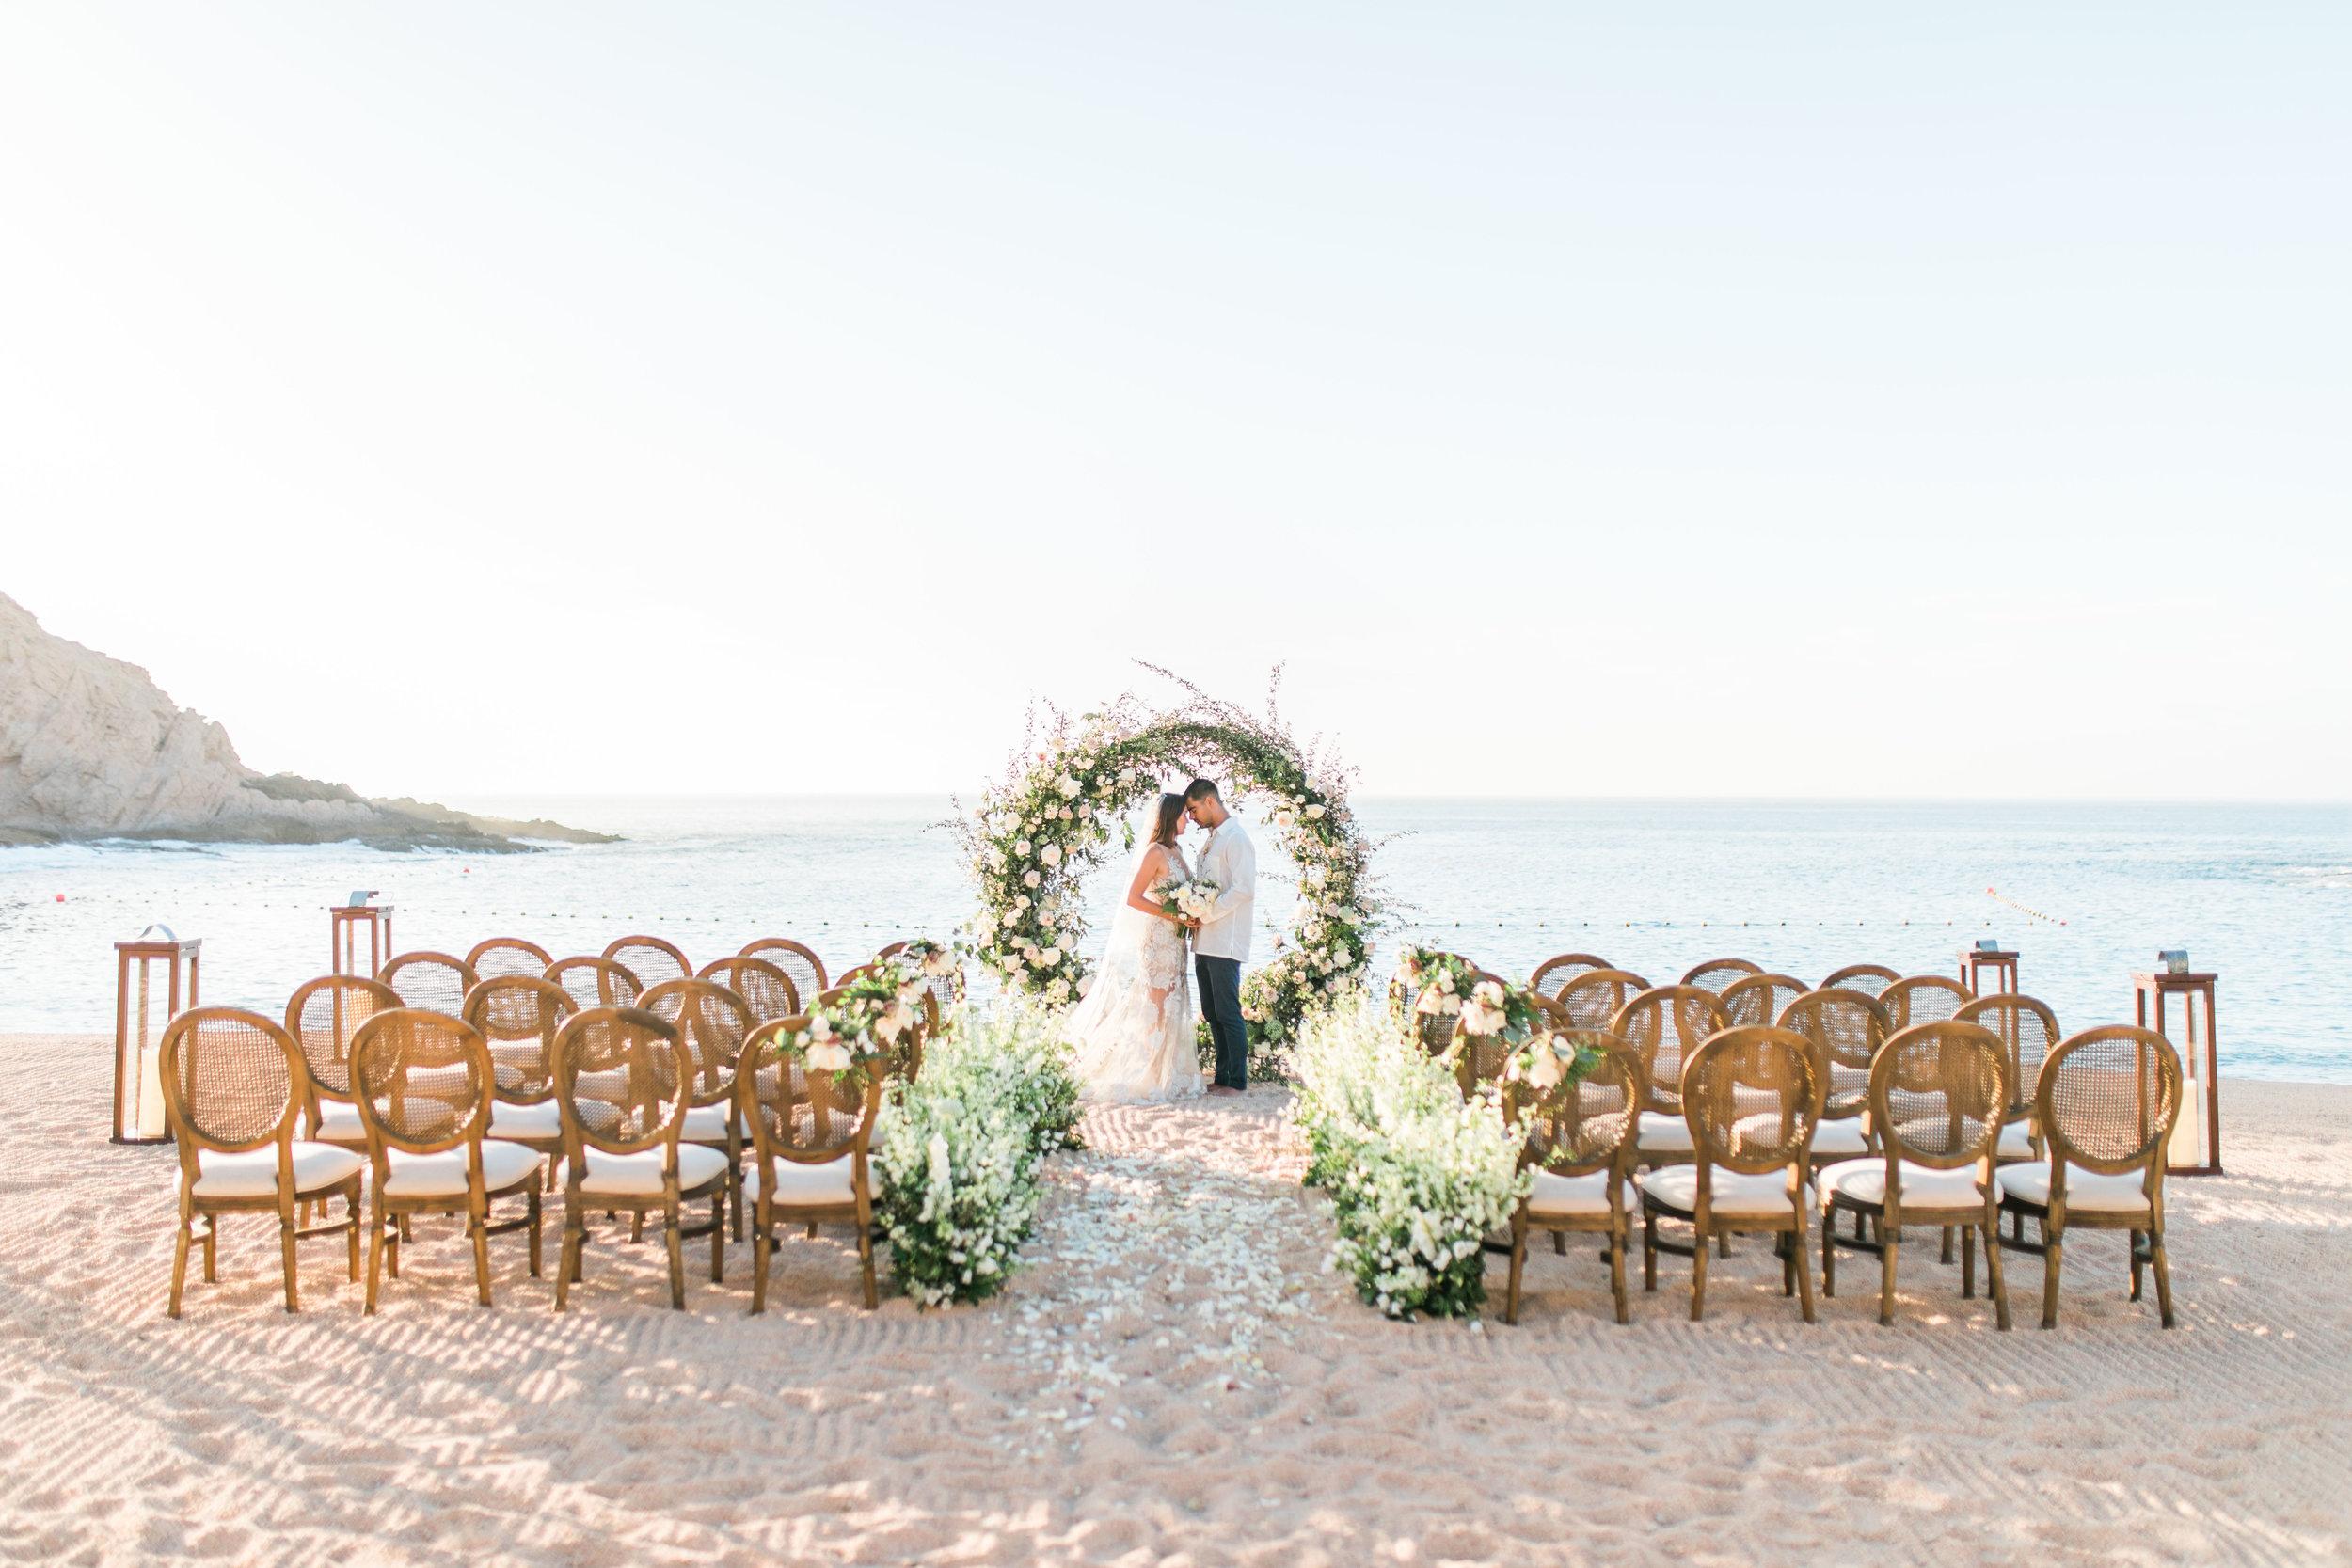 Montage-Cabo-Wedding-Photos-JBJ-Pictures-22.jpg